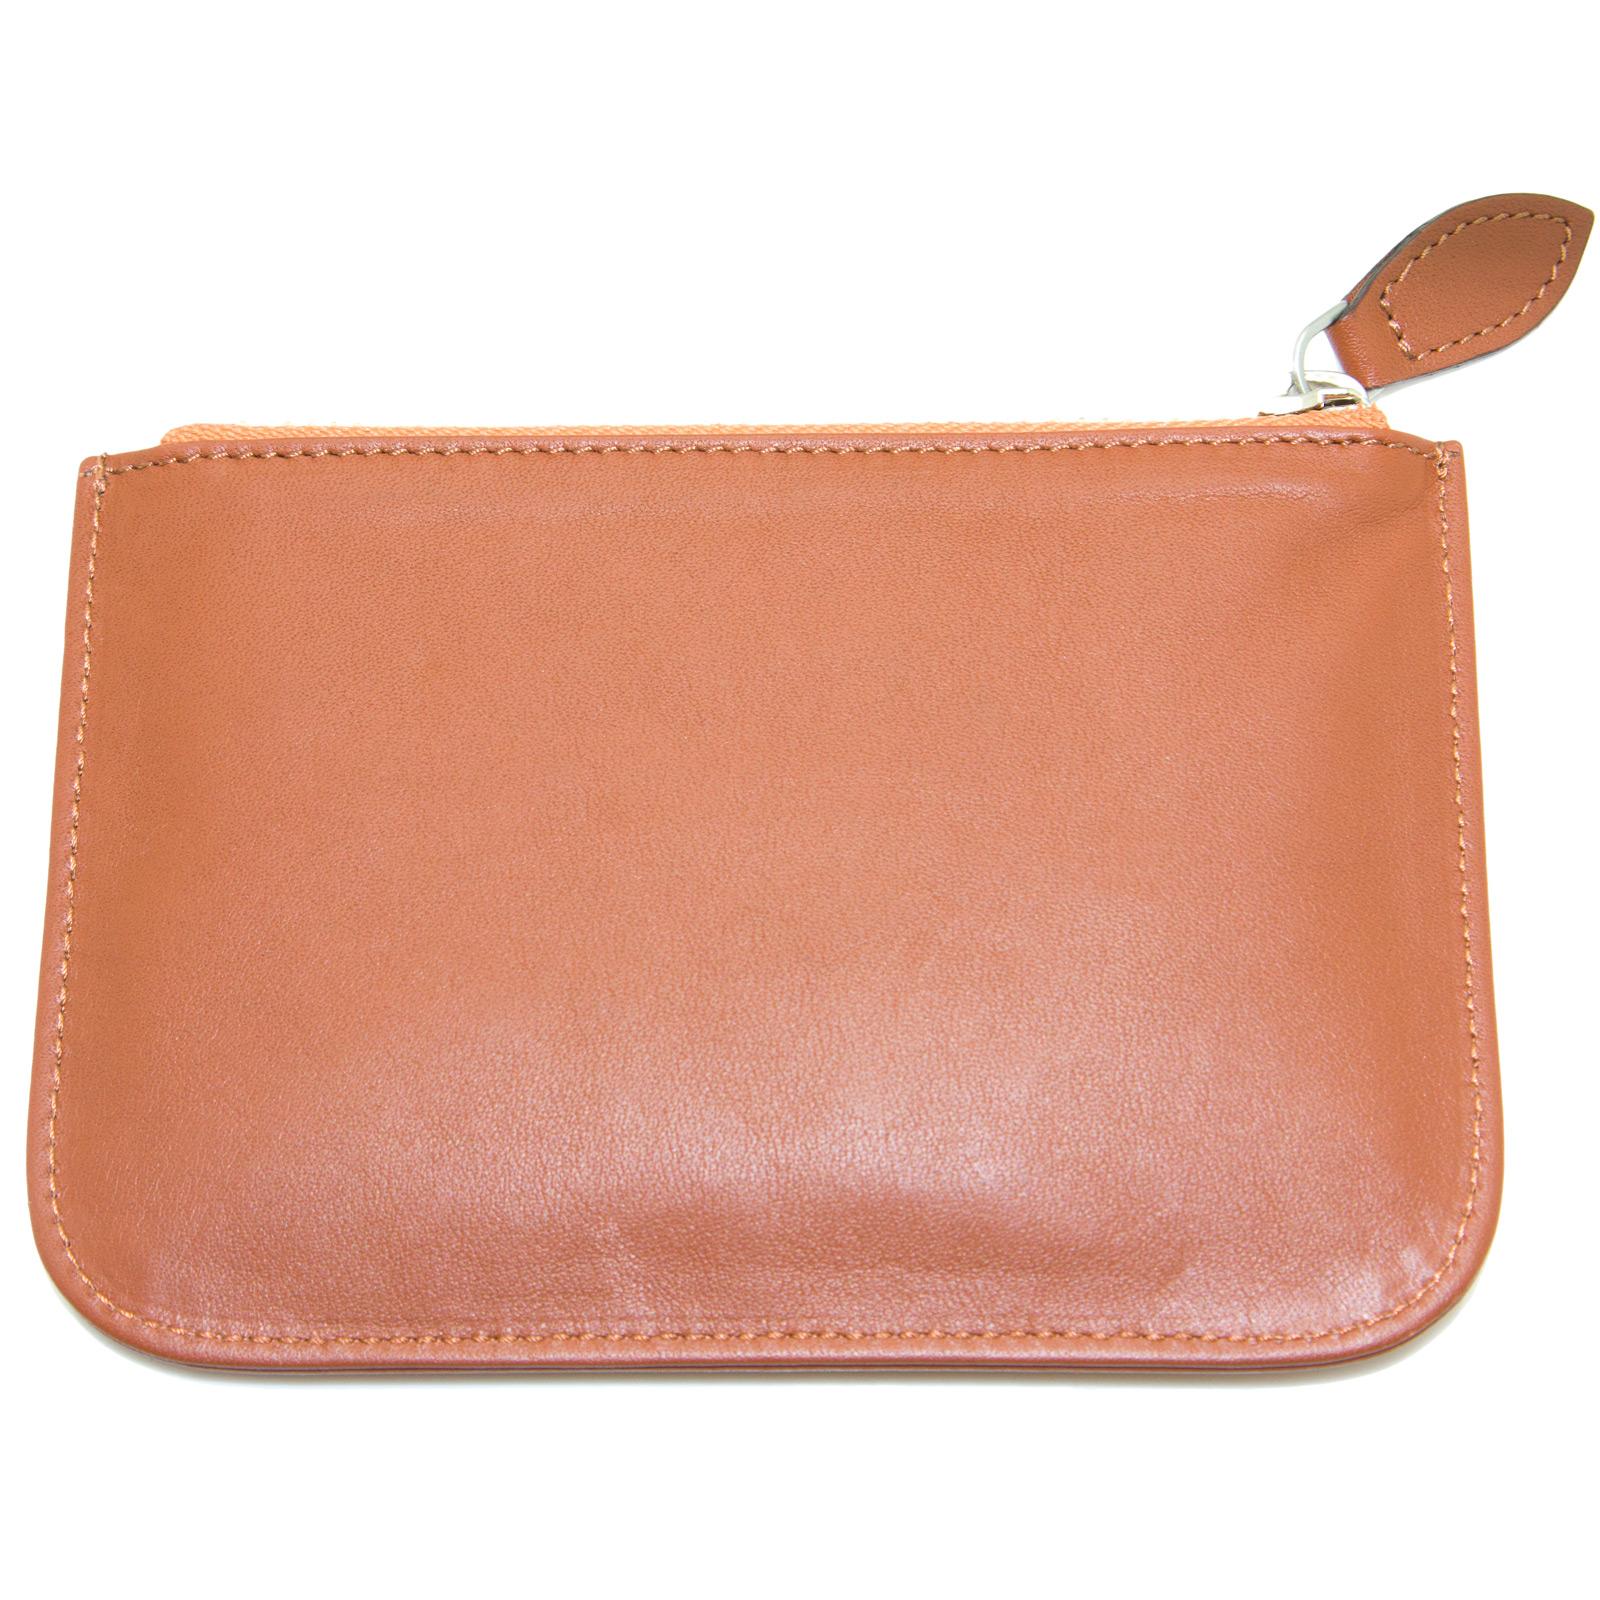 EMPORIO-ARMANI-Women-039-s-034-2012-034-Zip-Top-Coin-Purse-Wallet-YEMG99-195-NWT thumbnail 9